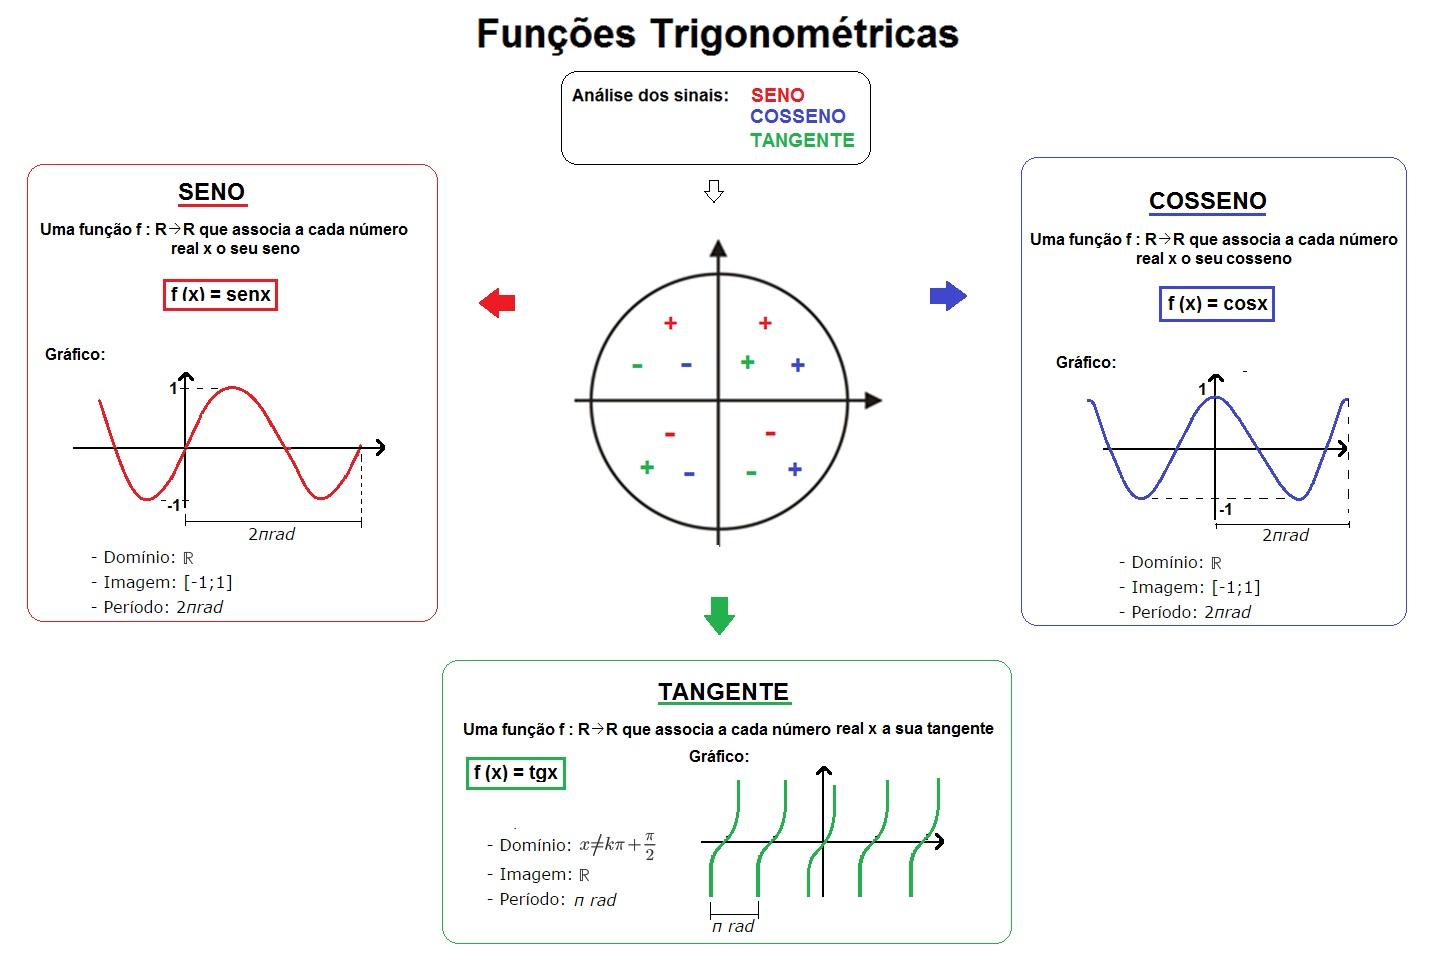 mapa-matematica-funcoes-trigonometricas